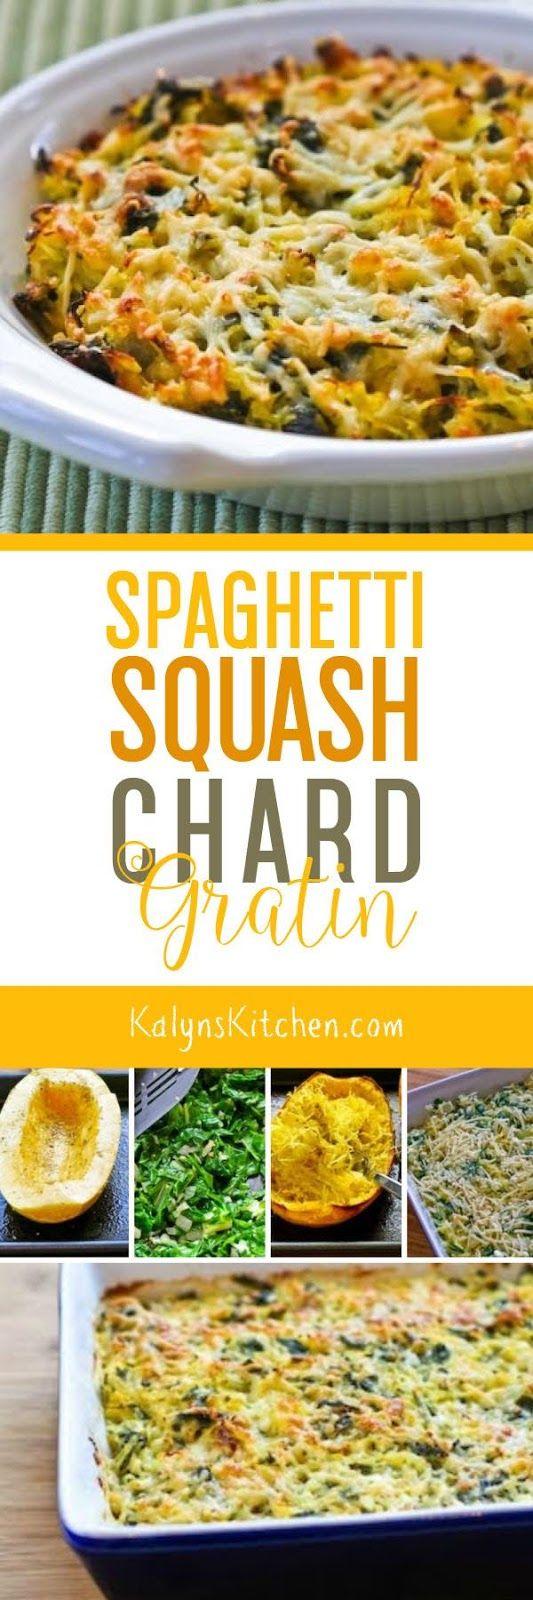 Spaghetti Squash And Chard Gratin